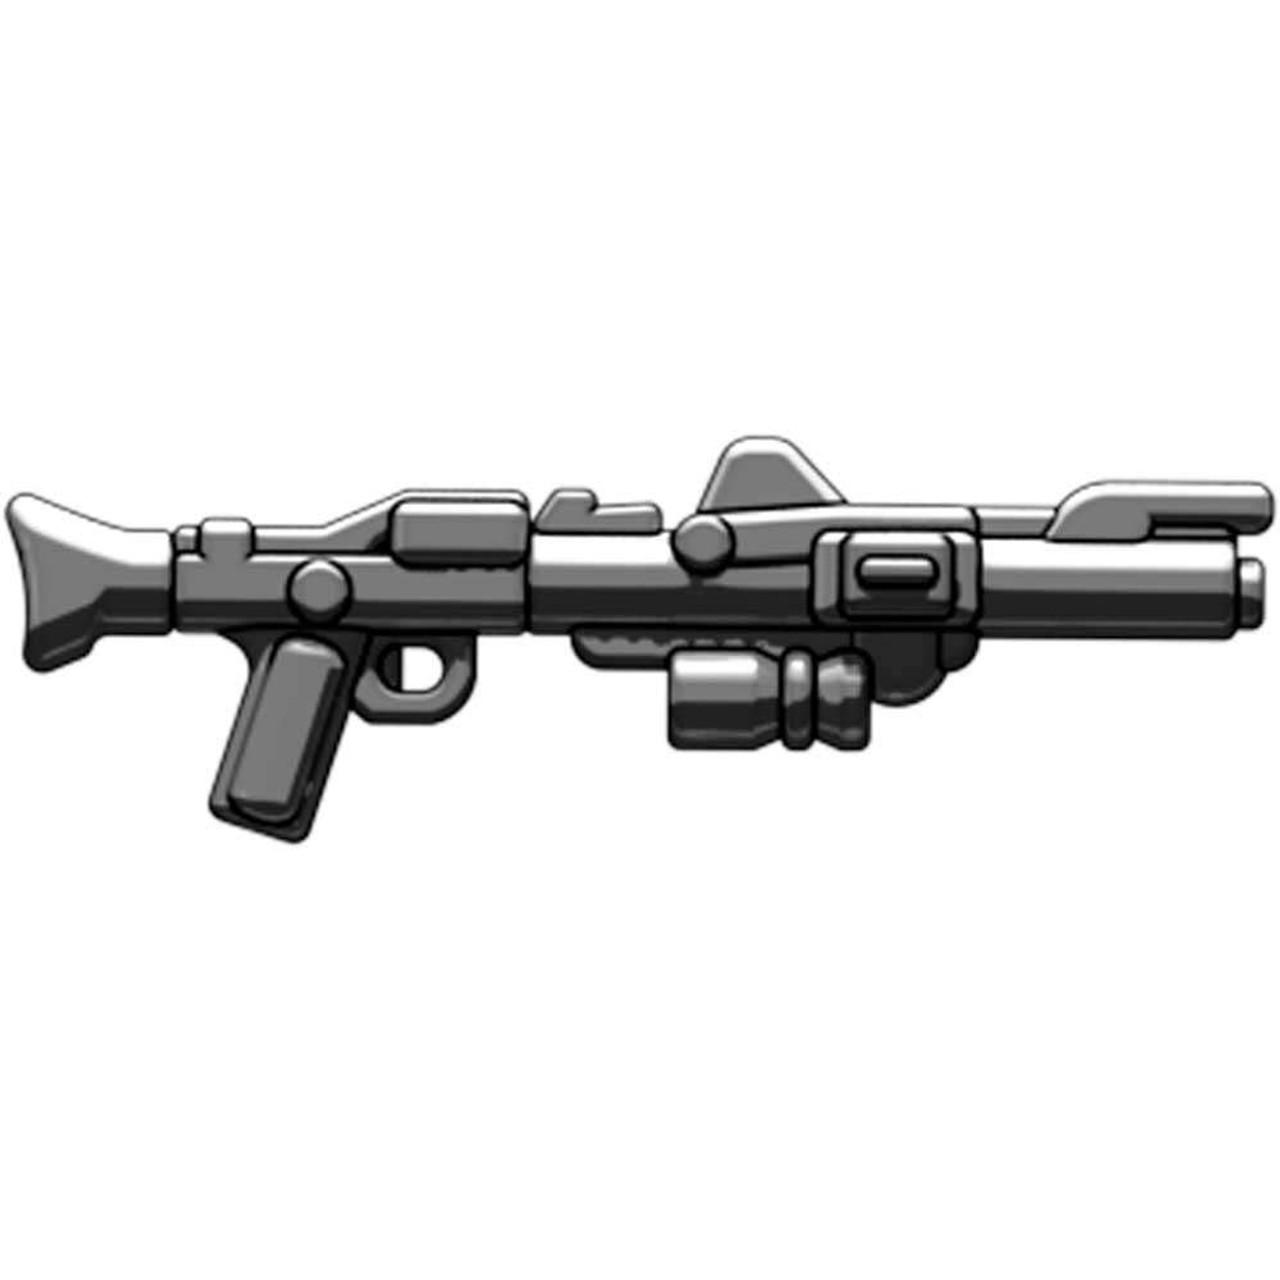 BrickArms Weapons DC-15 Blast Rifle 2.5-Inch [Black]